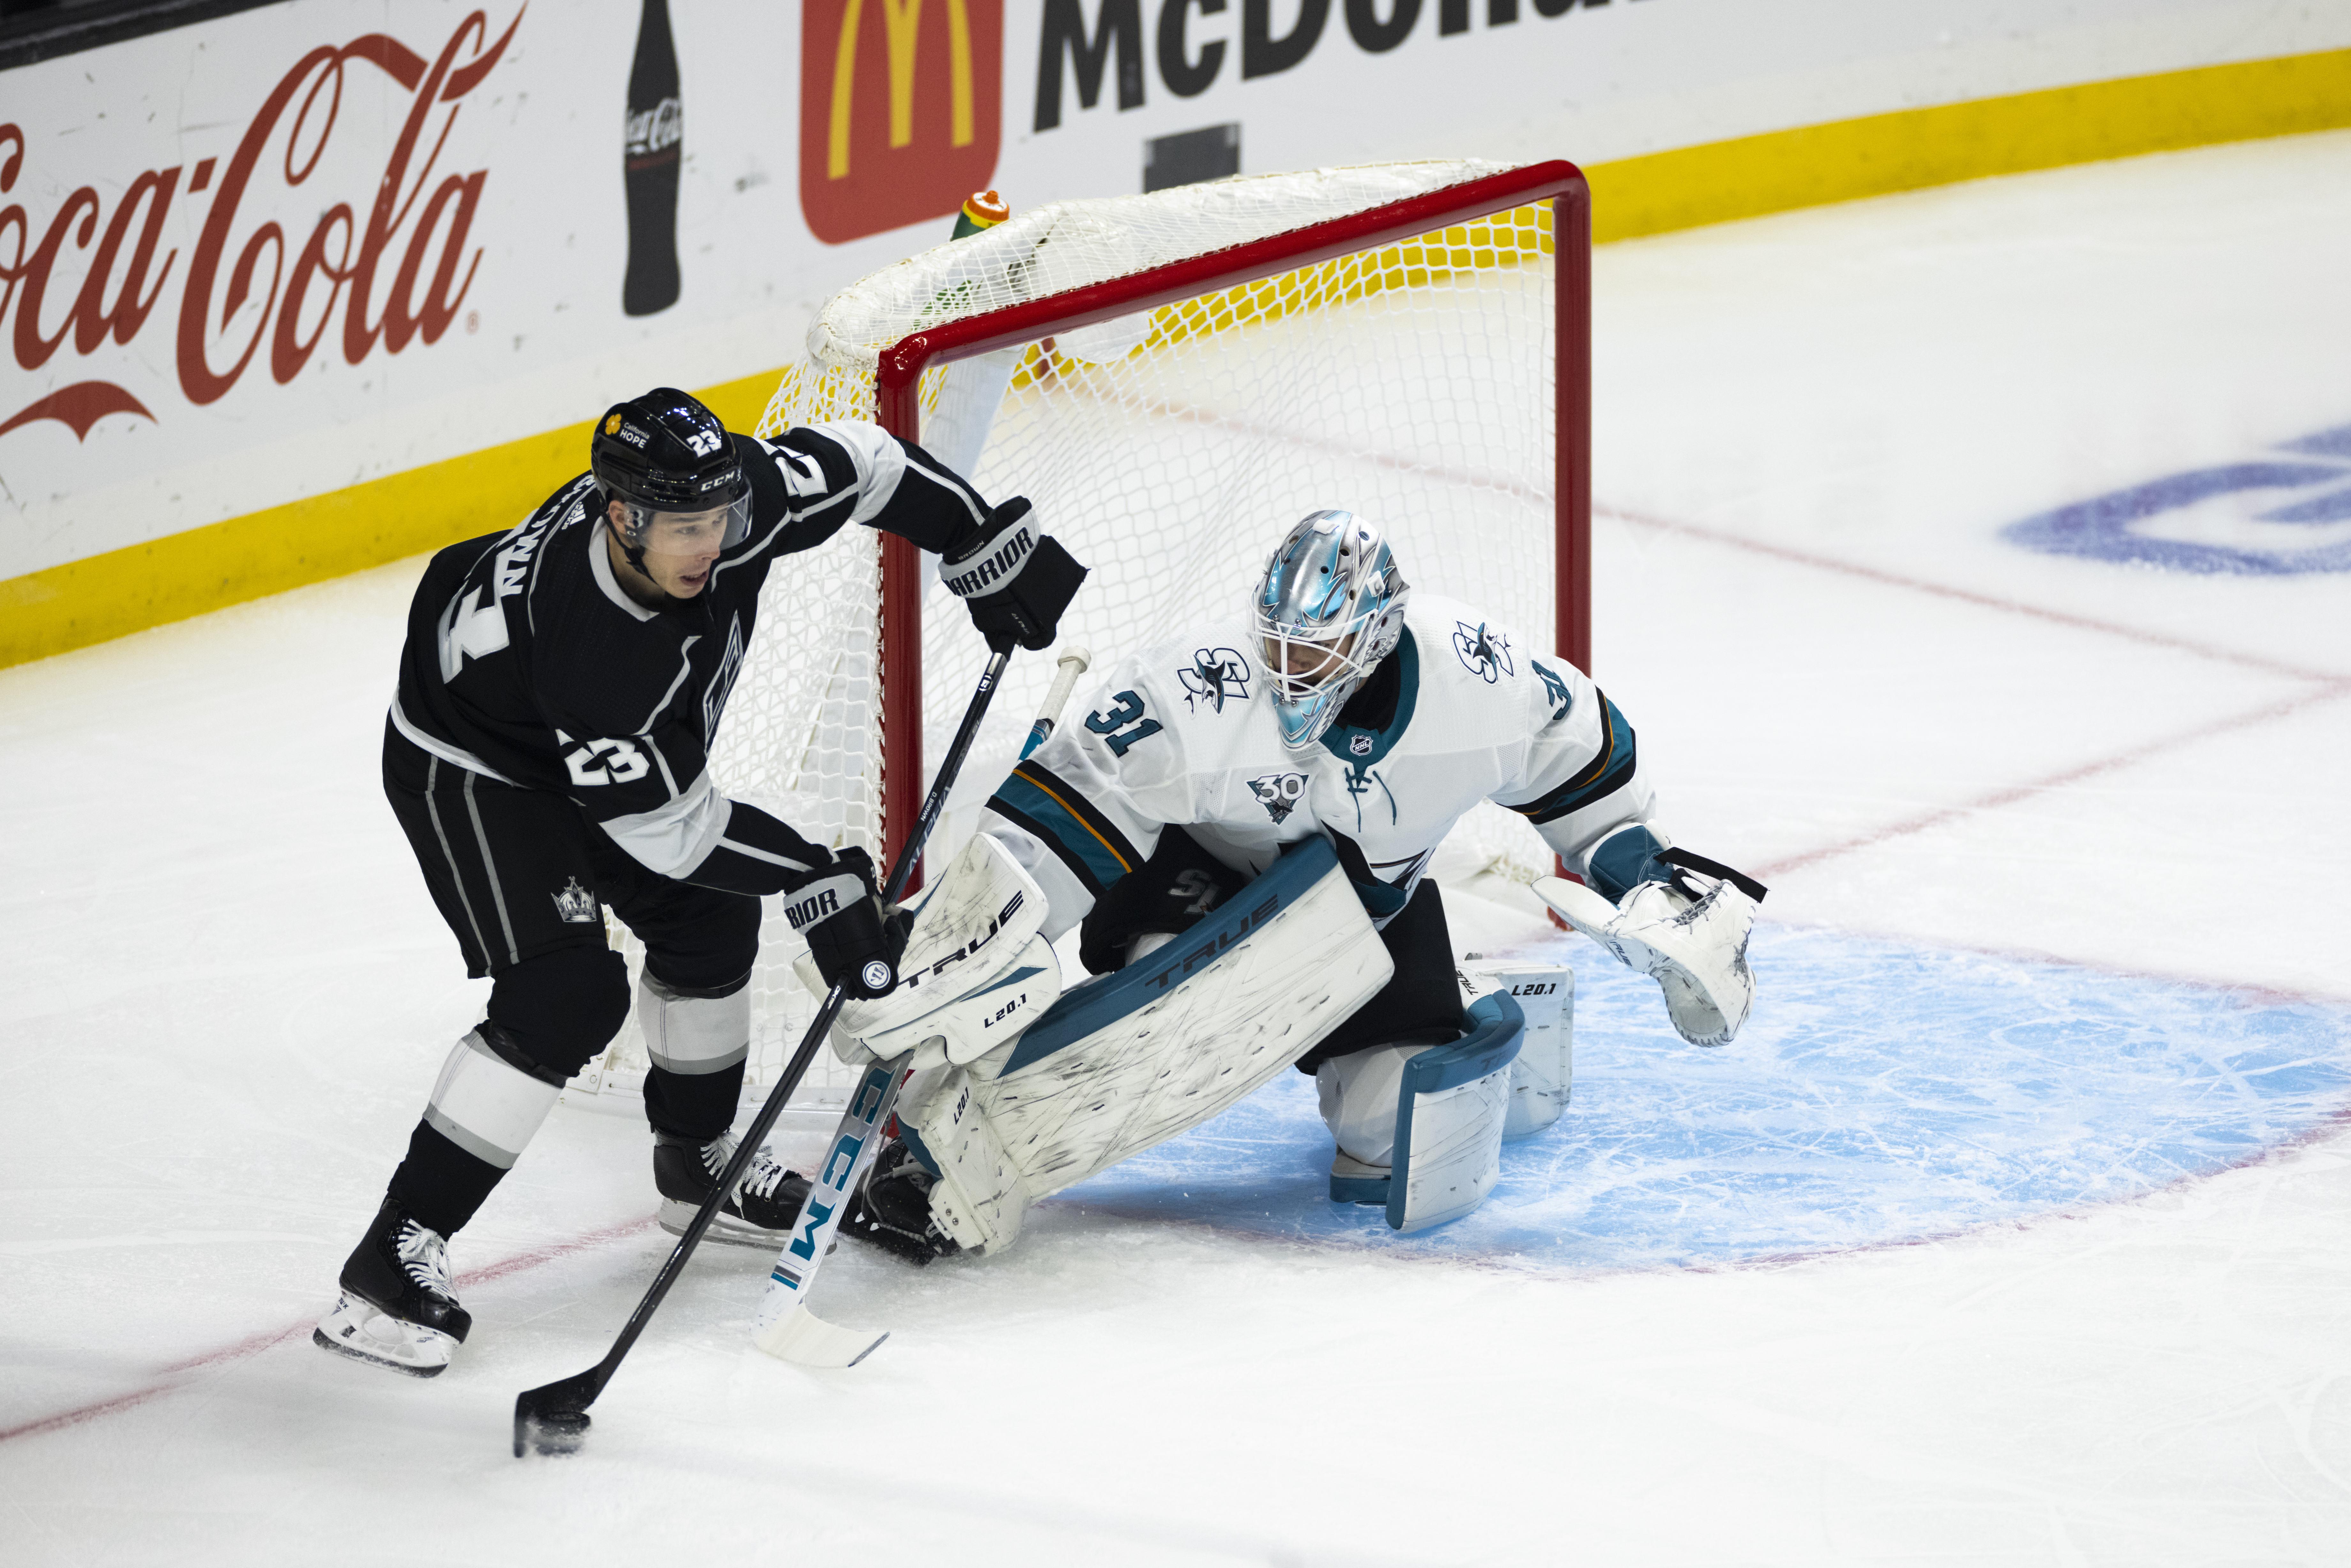 Los Angeles Kings right wing Dustin Brown (23) against San Jose Sharks goaltender Martin Jones (31) during the NHL regular season game on Thursday, February 11, 2021 at the Staples Center in Los Angeles, CA.